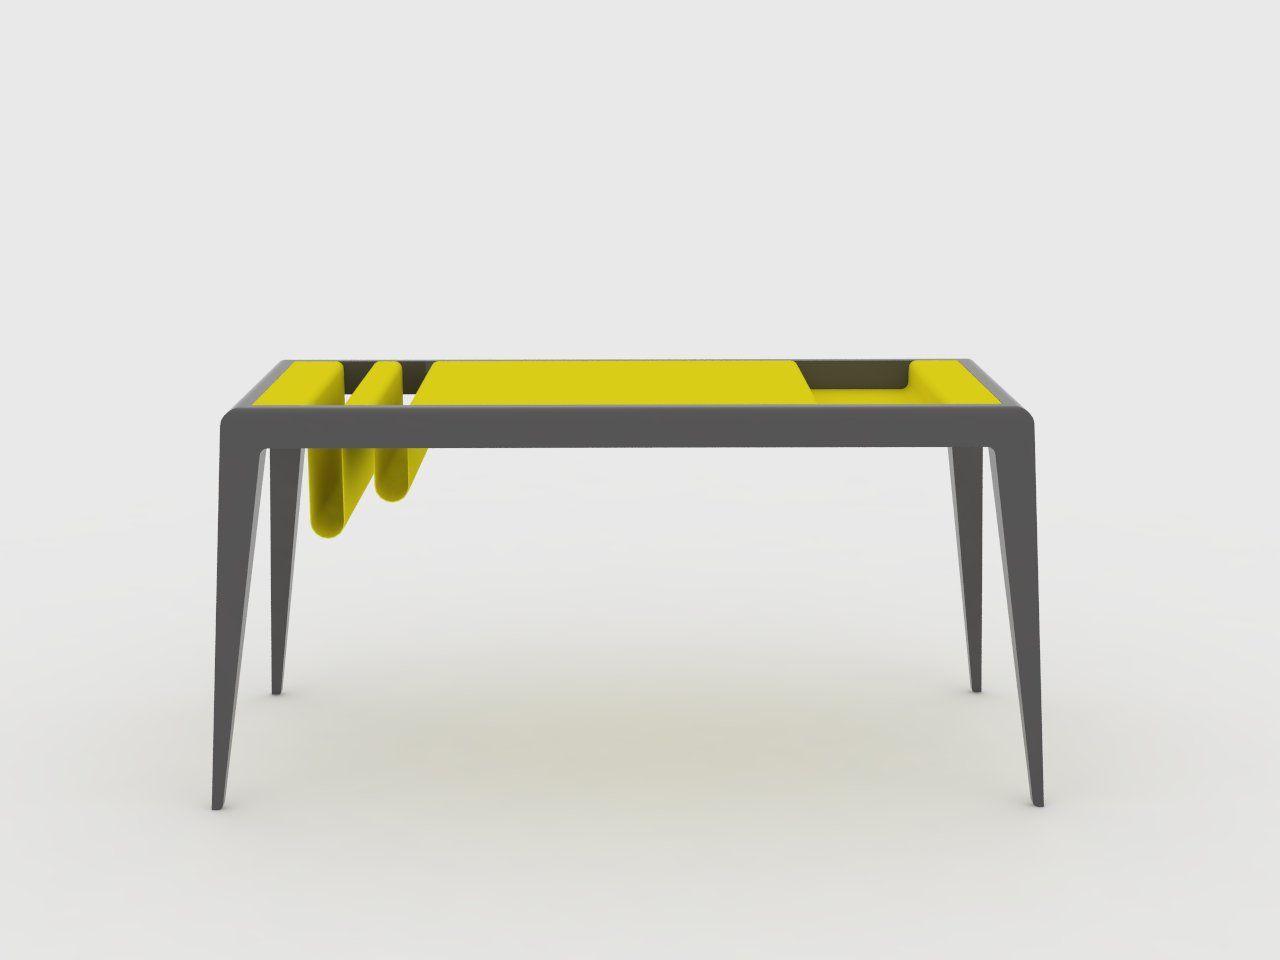 Ludovic Avenel Journees Europeennes Des Metiers D Art 2015 Home Decor Furniture Decor